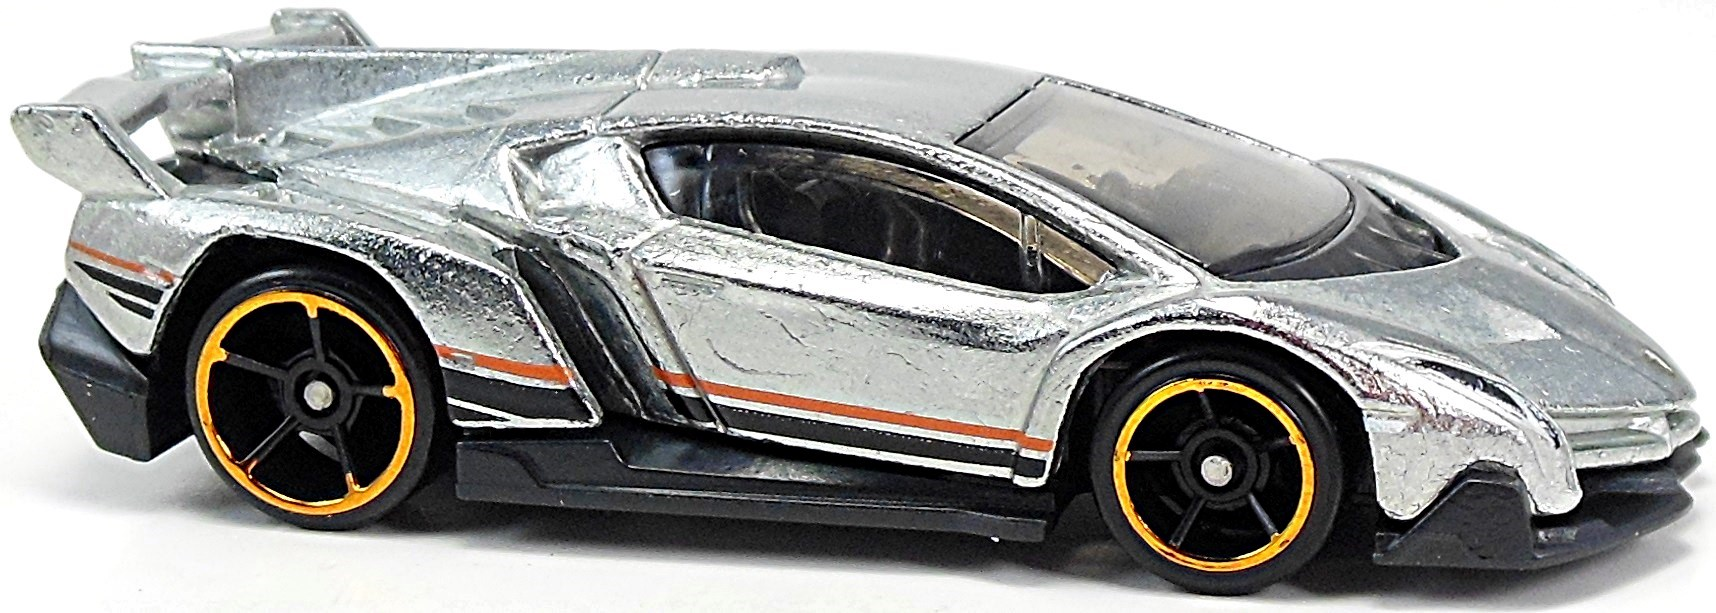 Lamborghini Veneno 73mm 2014 Hot Wheels Newsletter